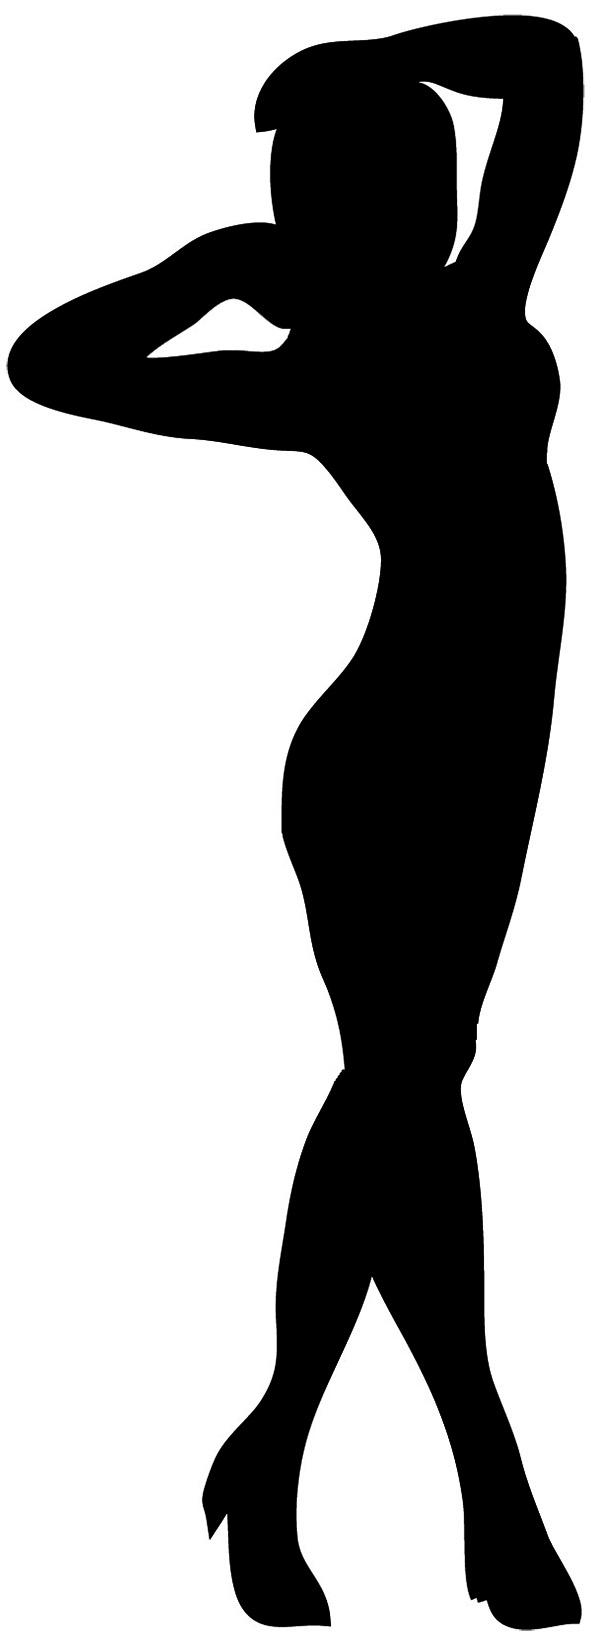 Black silhouette clipart jpg transparent stock Female Silhouette jpg transparent stock